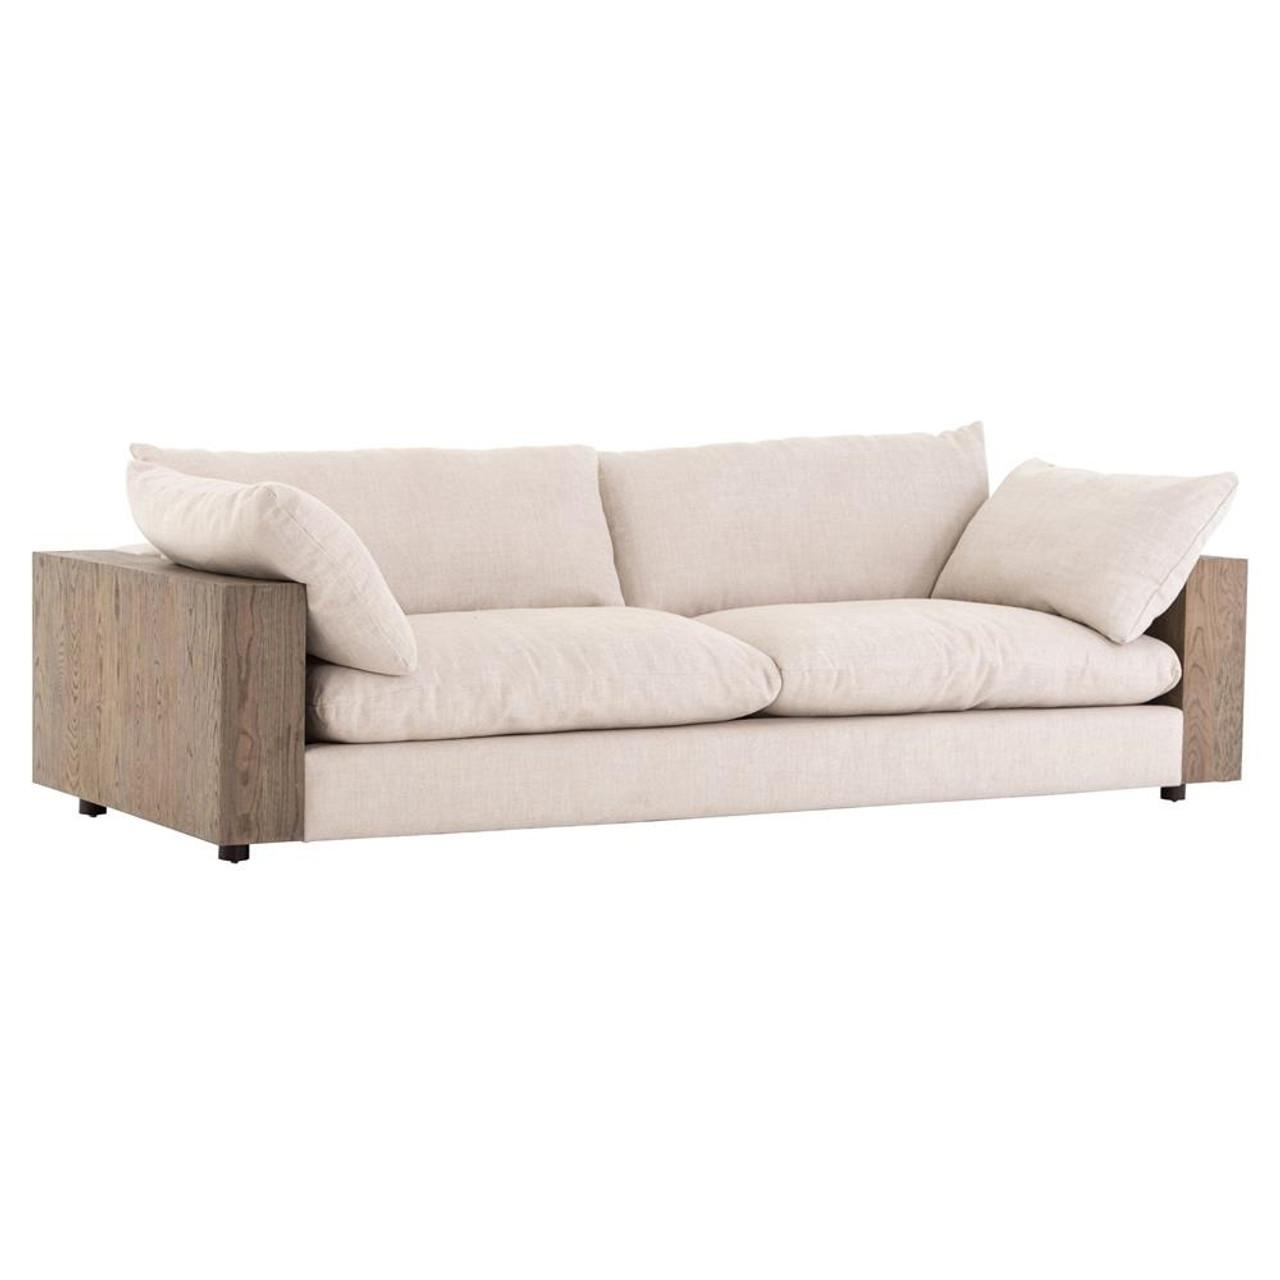 Rustic Beach Bedroom Furniture